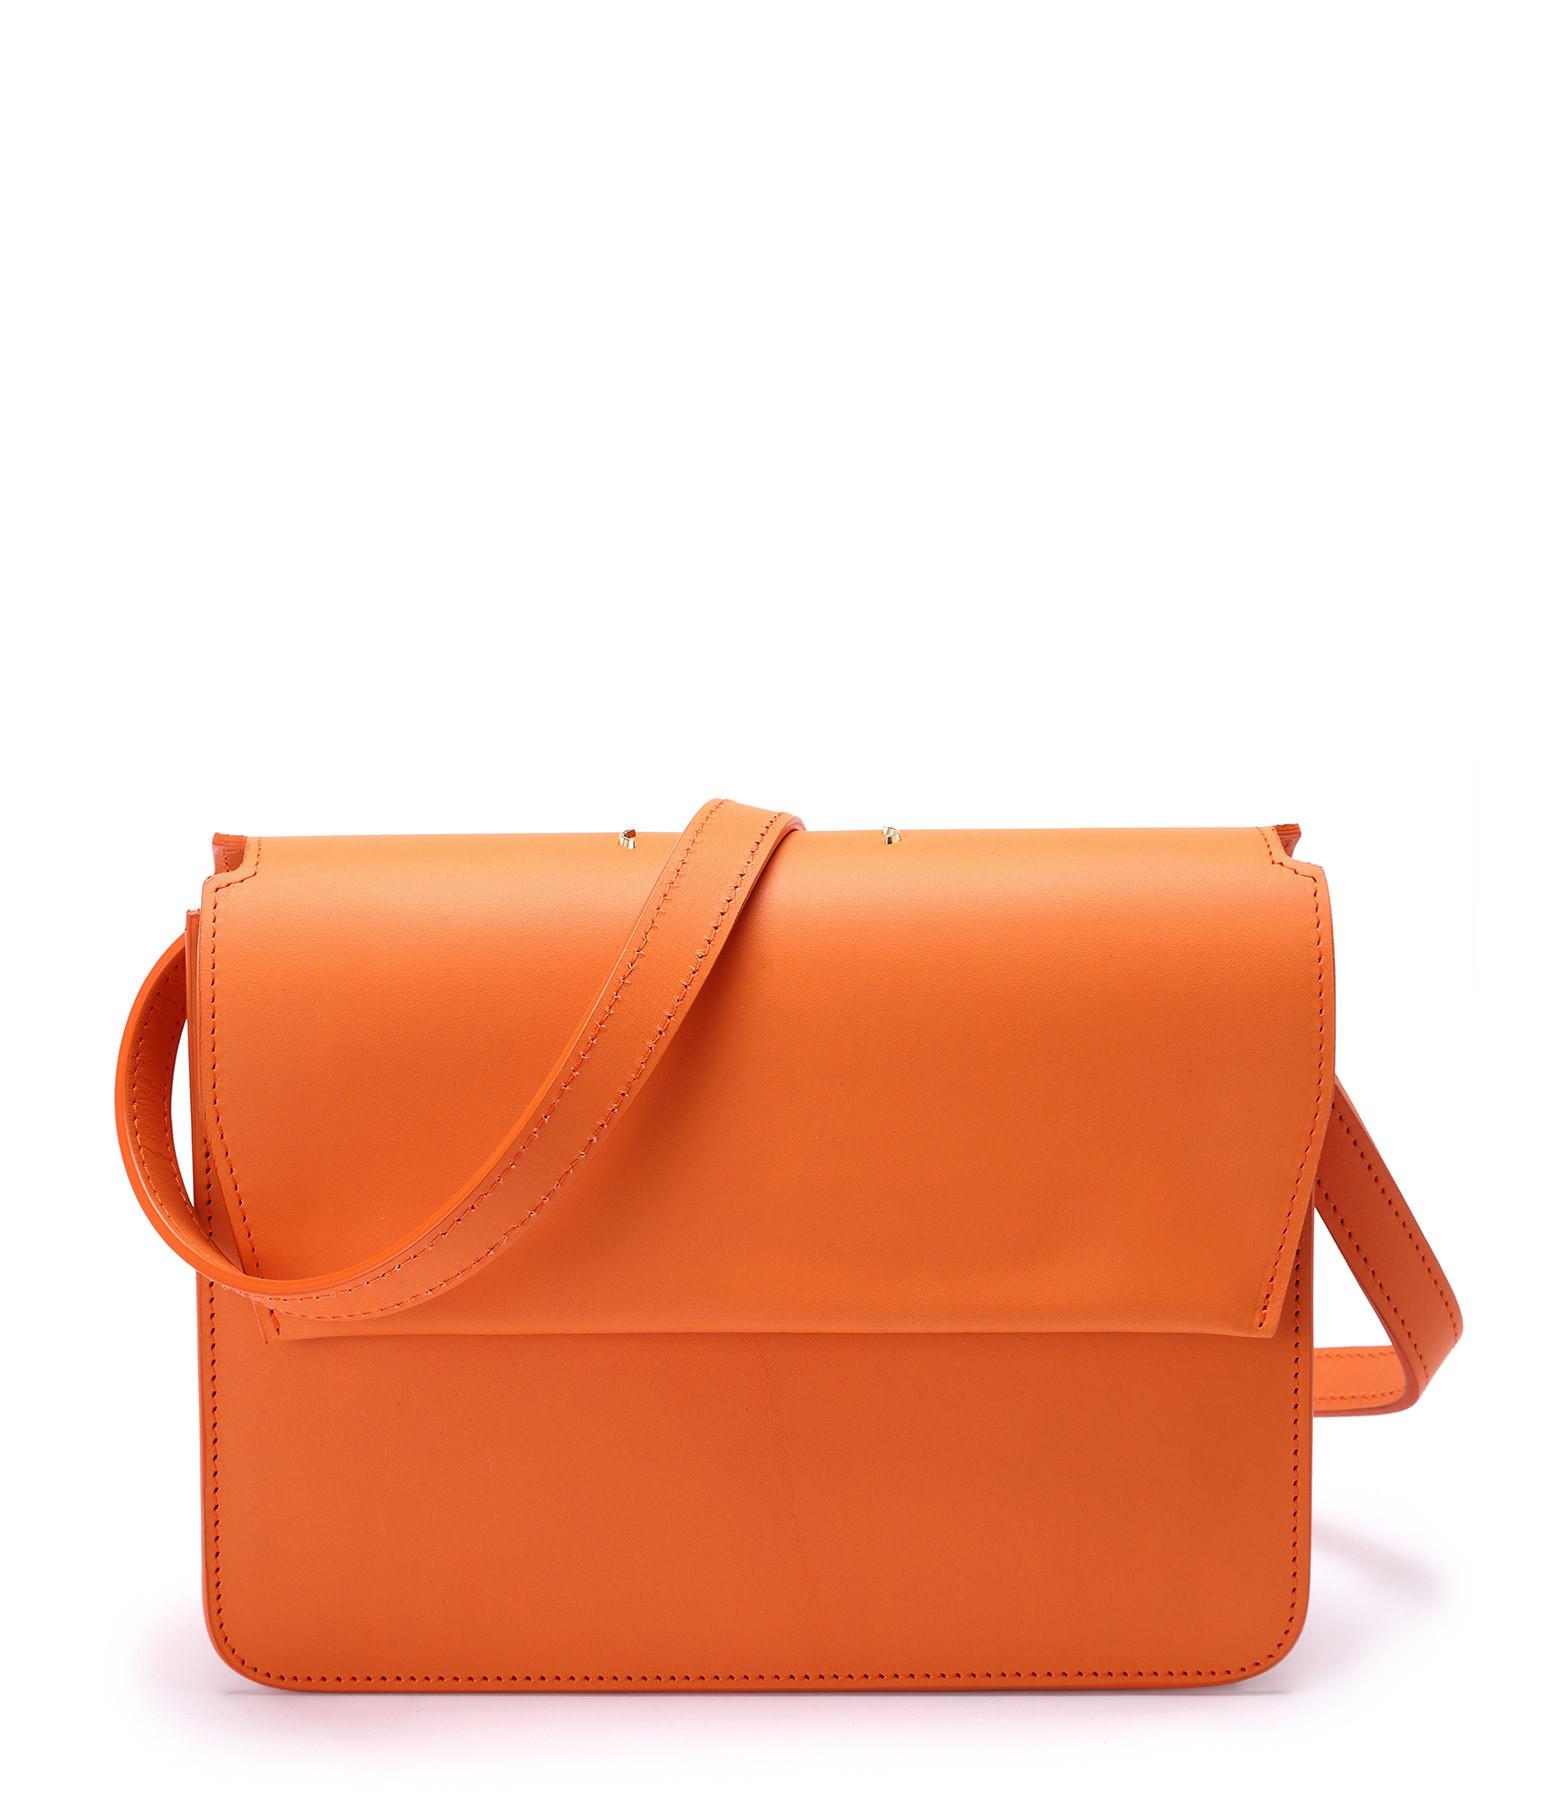 PB 0110 - Sac Cuir Orange